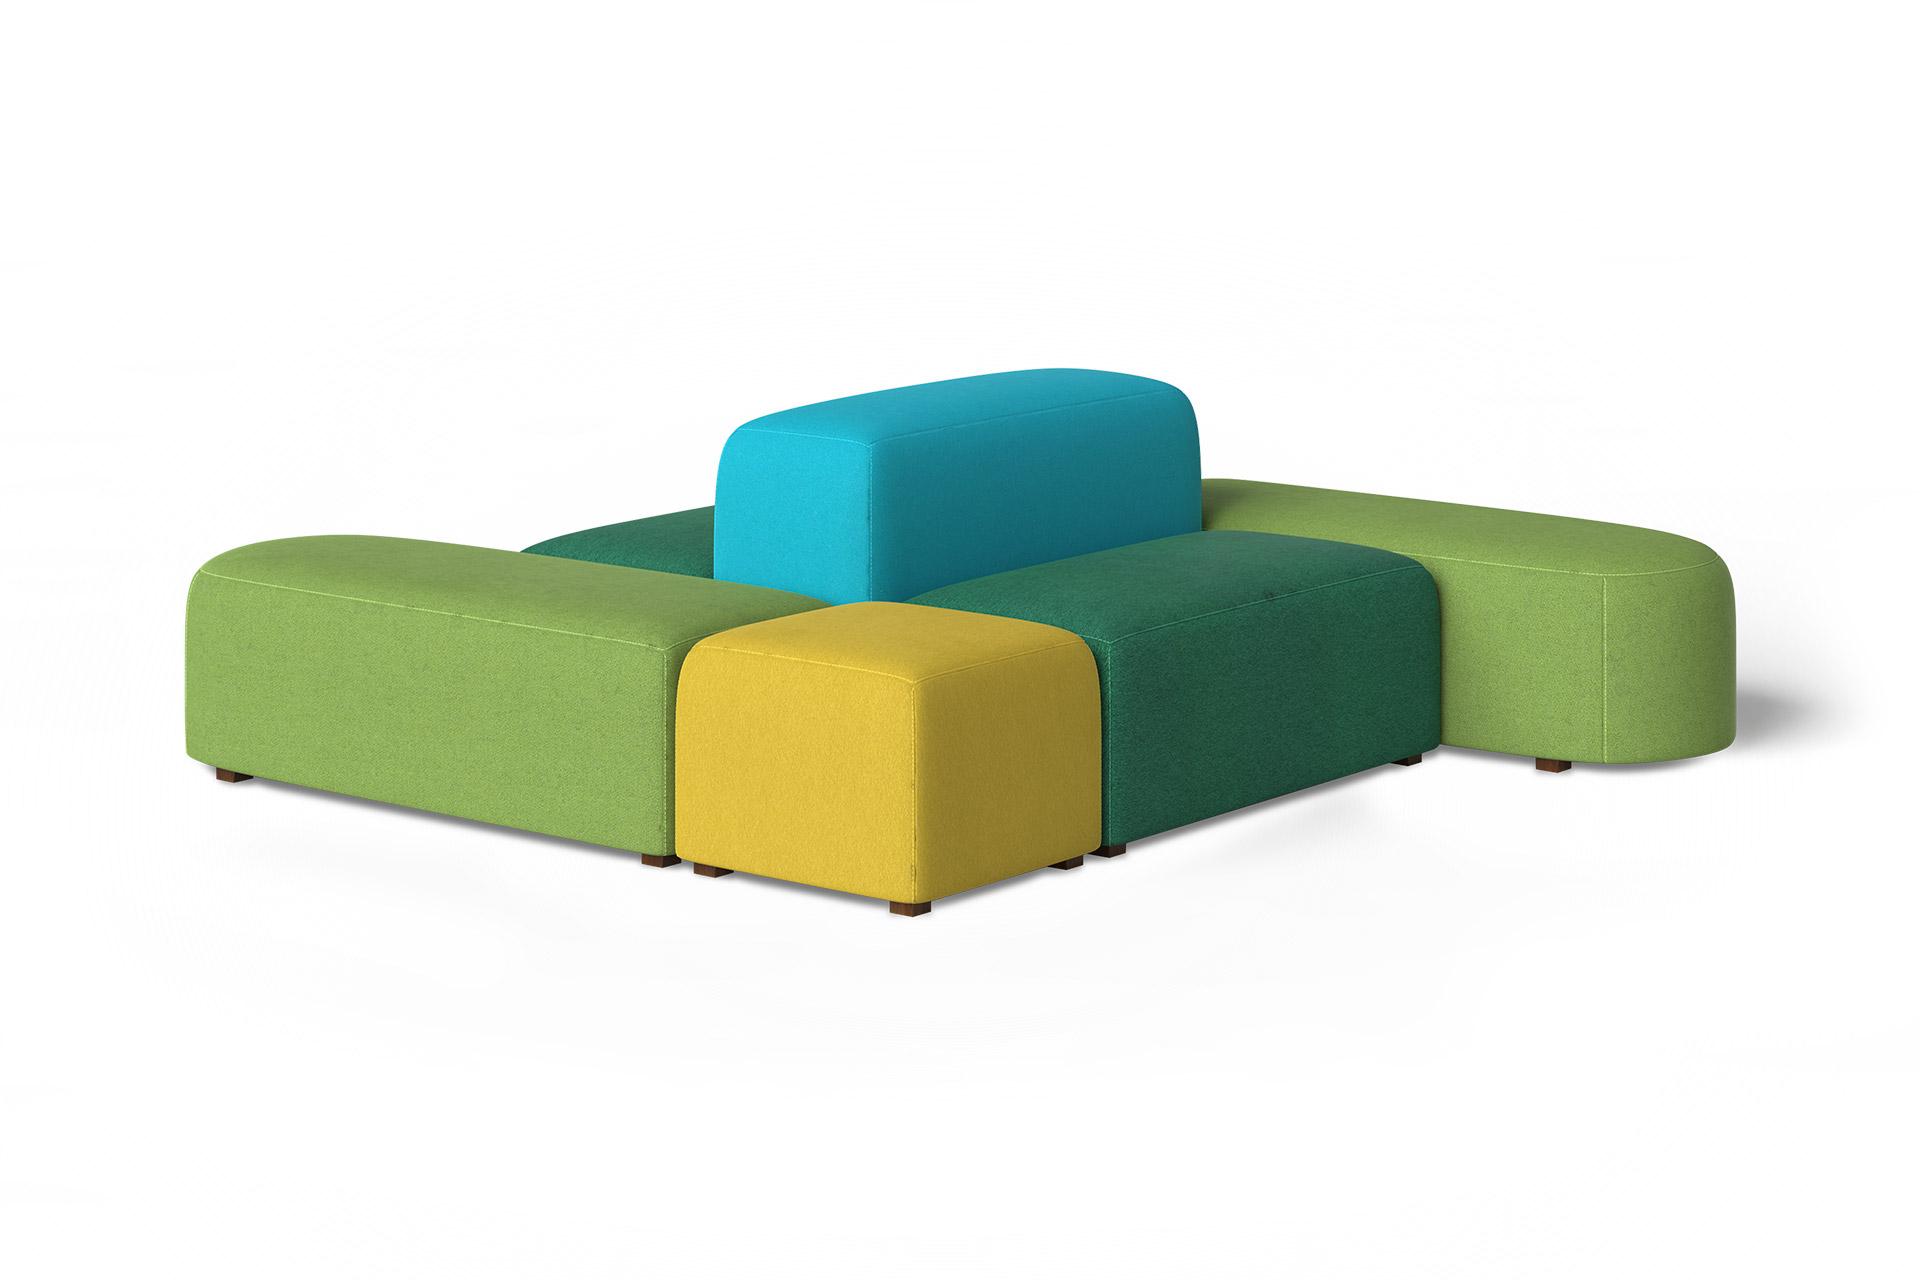 loft-and-manor-switch-modular-lounge-rectangular-ottoman-1